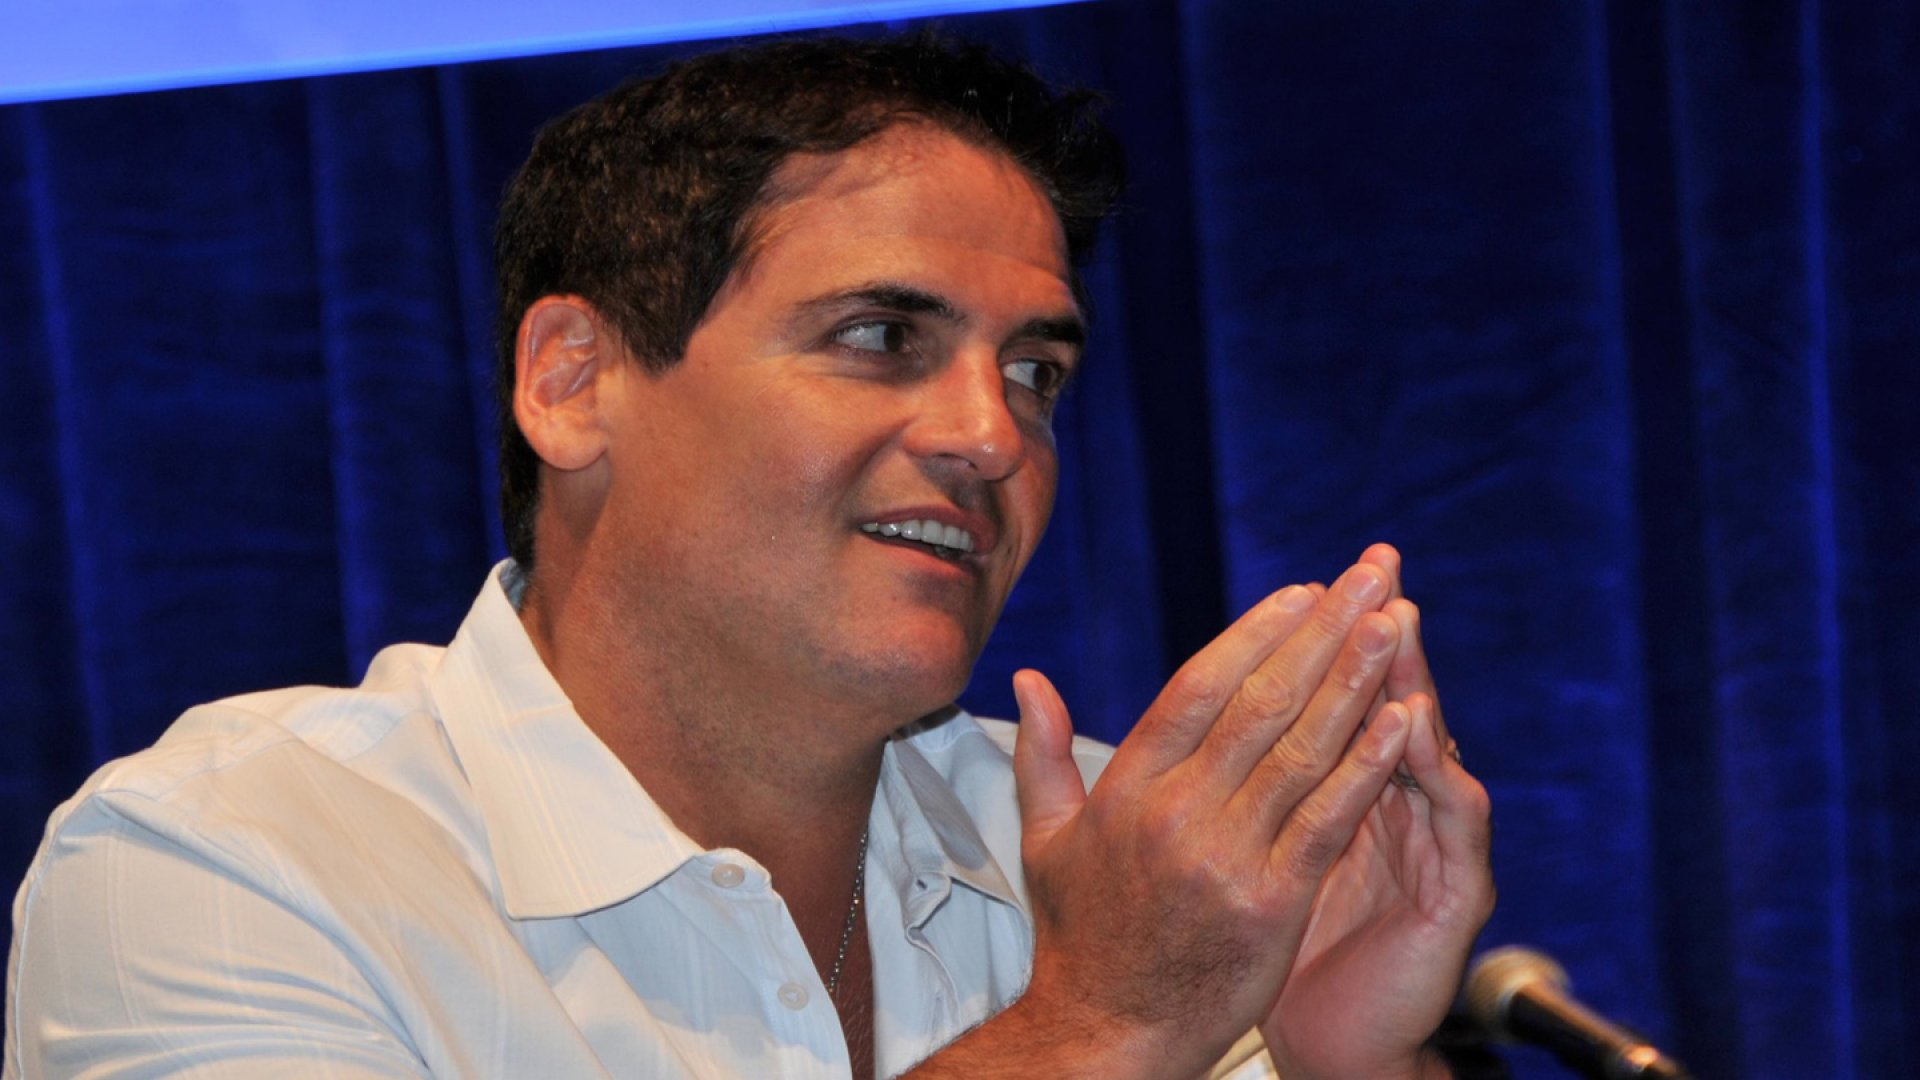 Mark Cuban Strikes Again at Facebook